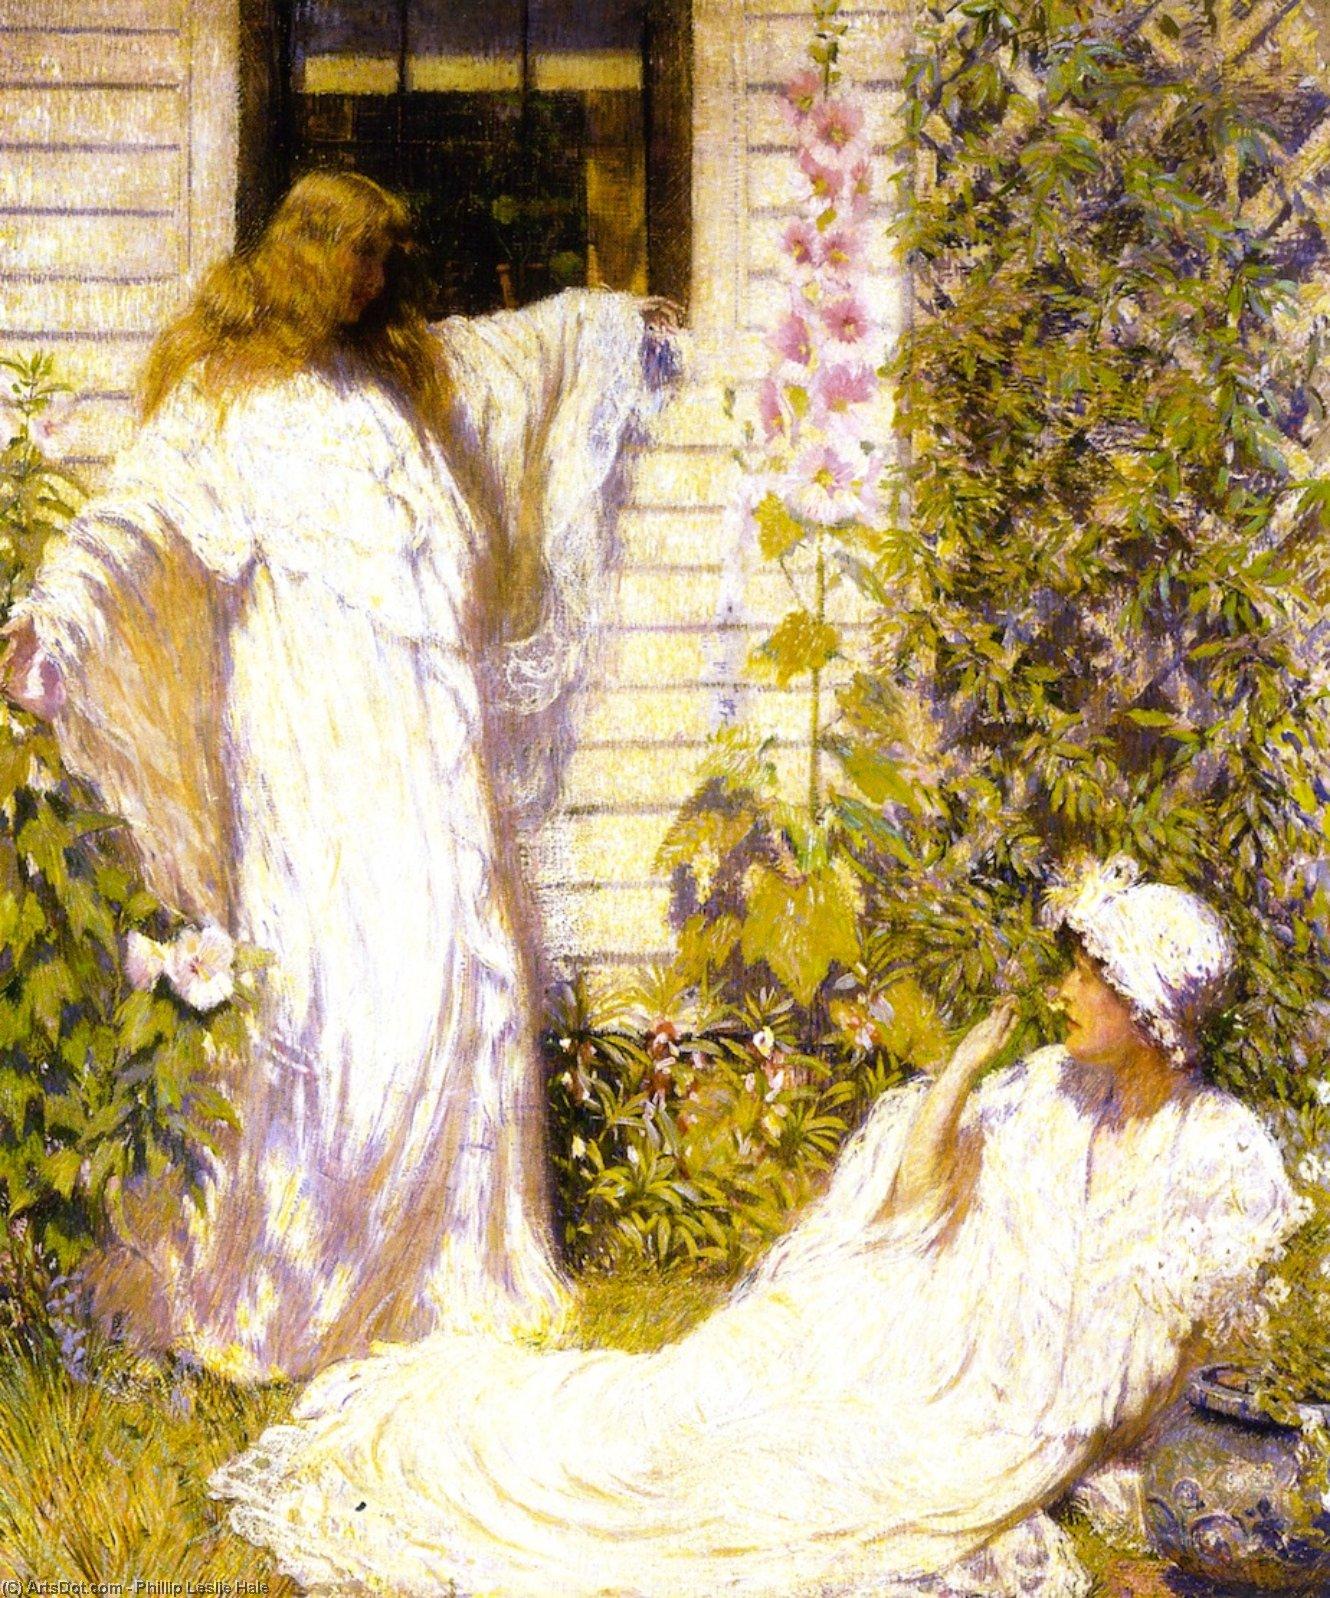 Wikioo.org - The Encyclopedia of Fine Arts - Painting, Artwork by Philip Leslie Hale - Sun Bath